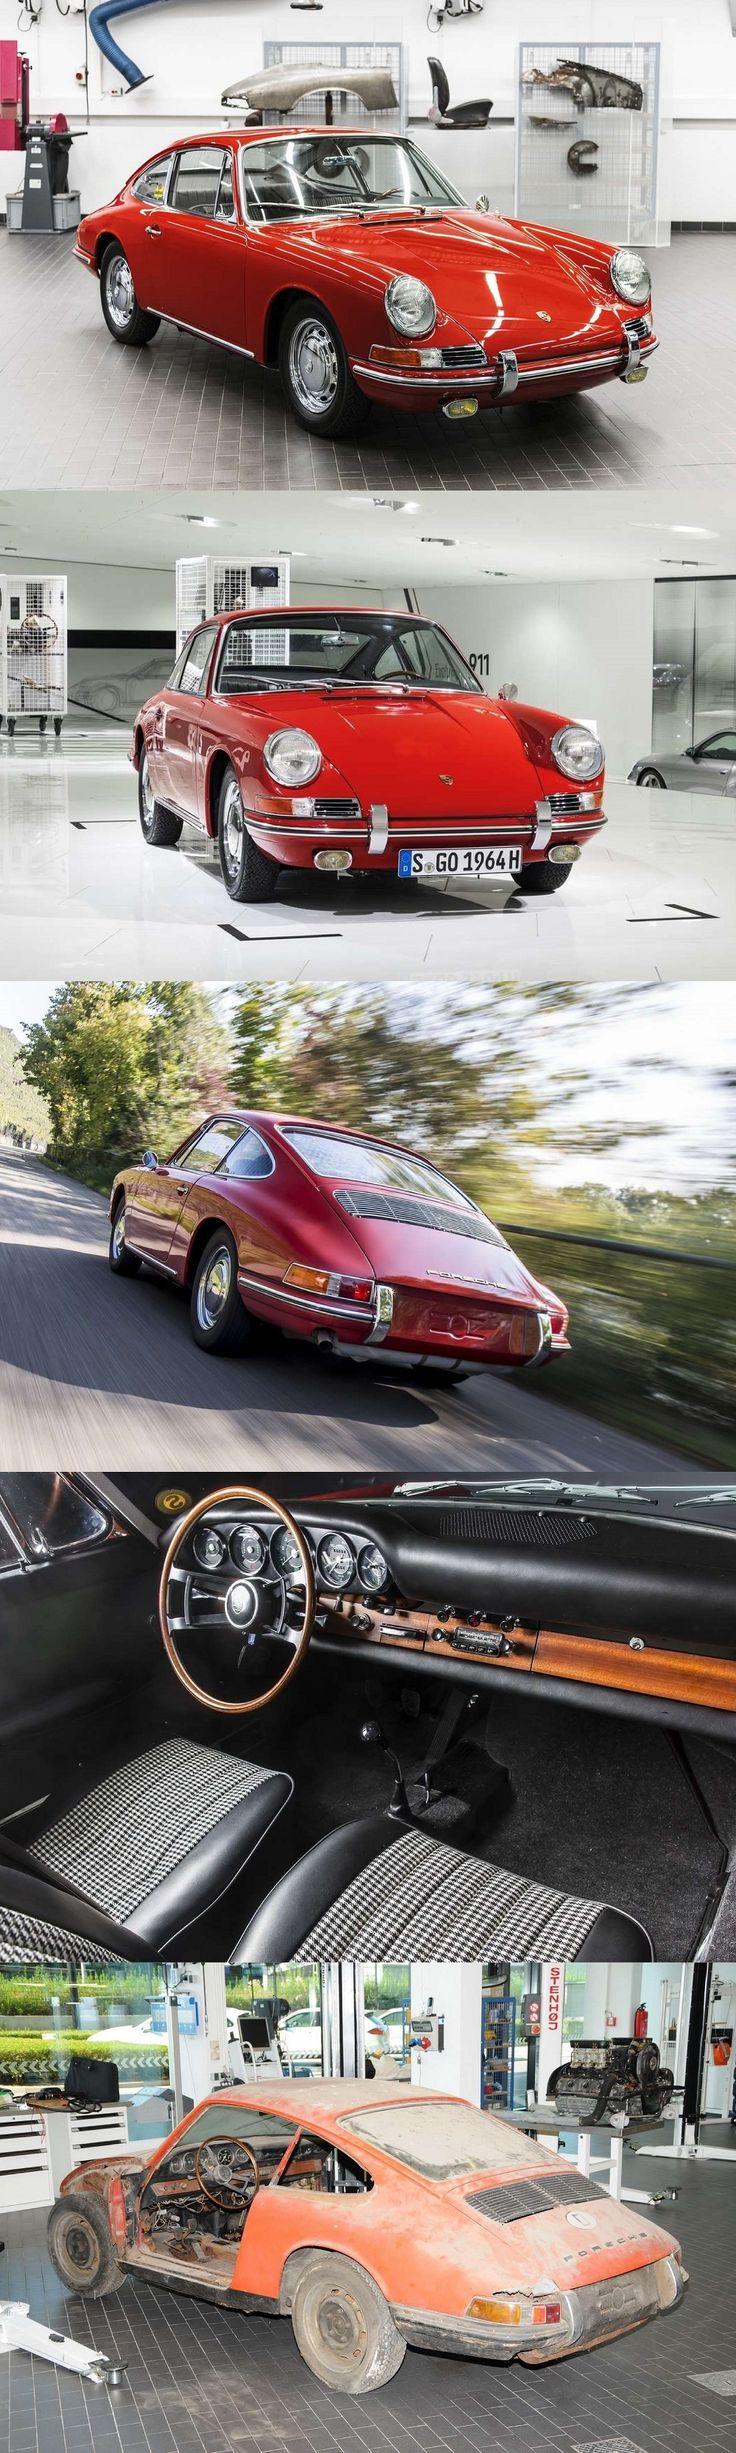 1964 Porsche 901 #57 / 17-462 / restored by Porsche Classic / Germany / 911 / red